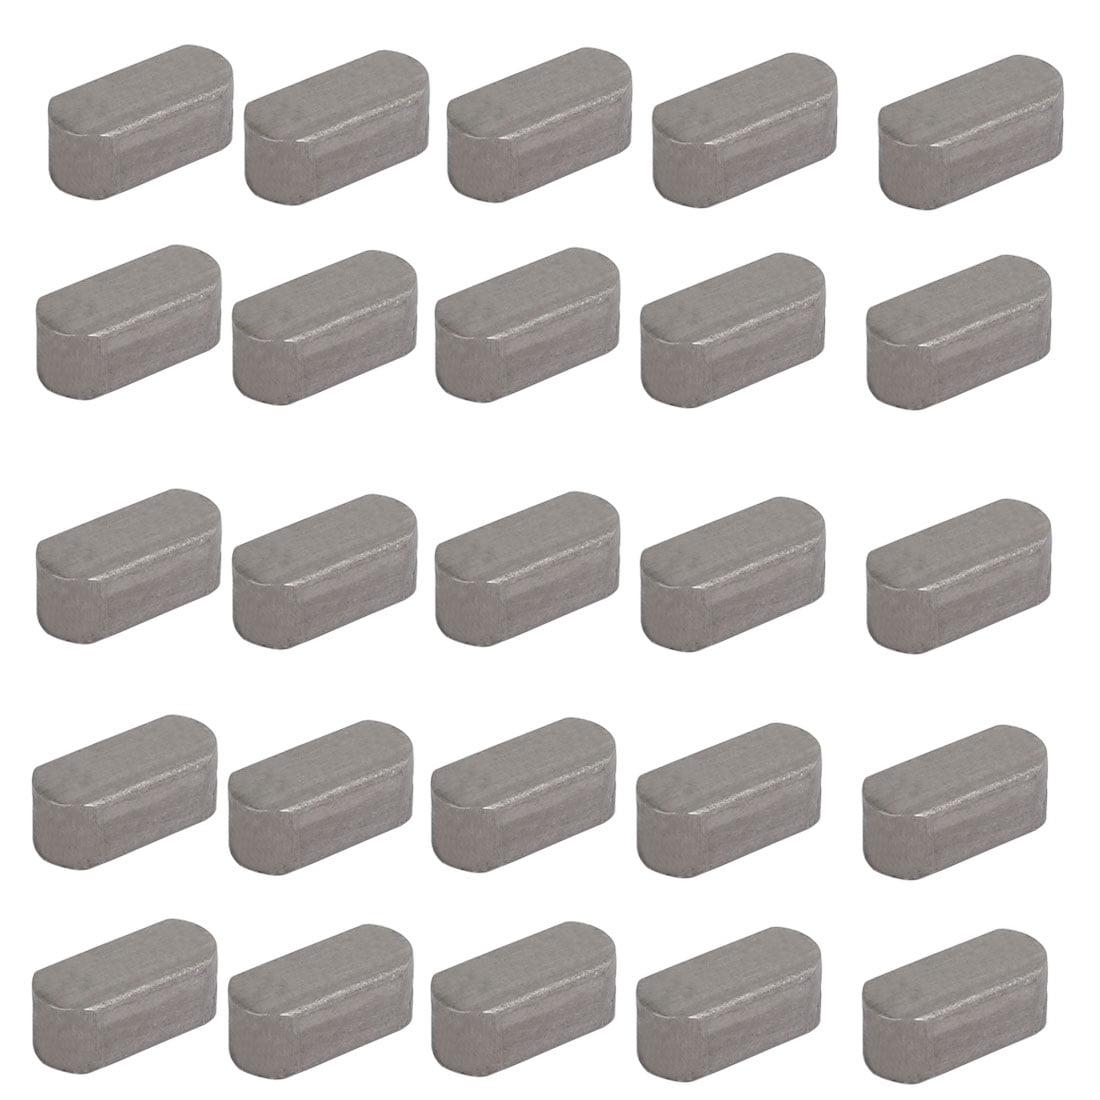 Unique Bargains 18mmx8mmx7mm Carbon Steel Key Stock To Lock Pulleys 25pcs - image 2 de 3